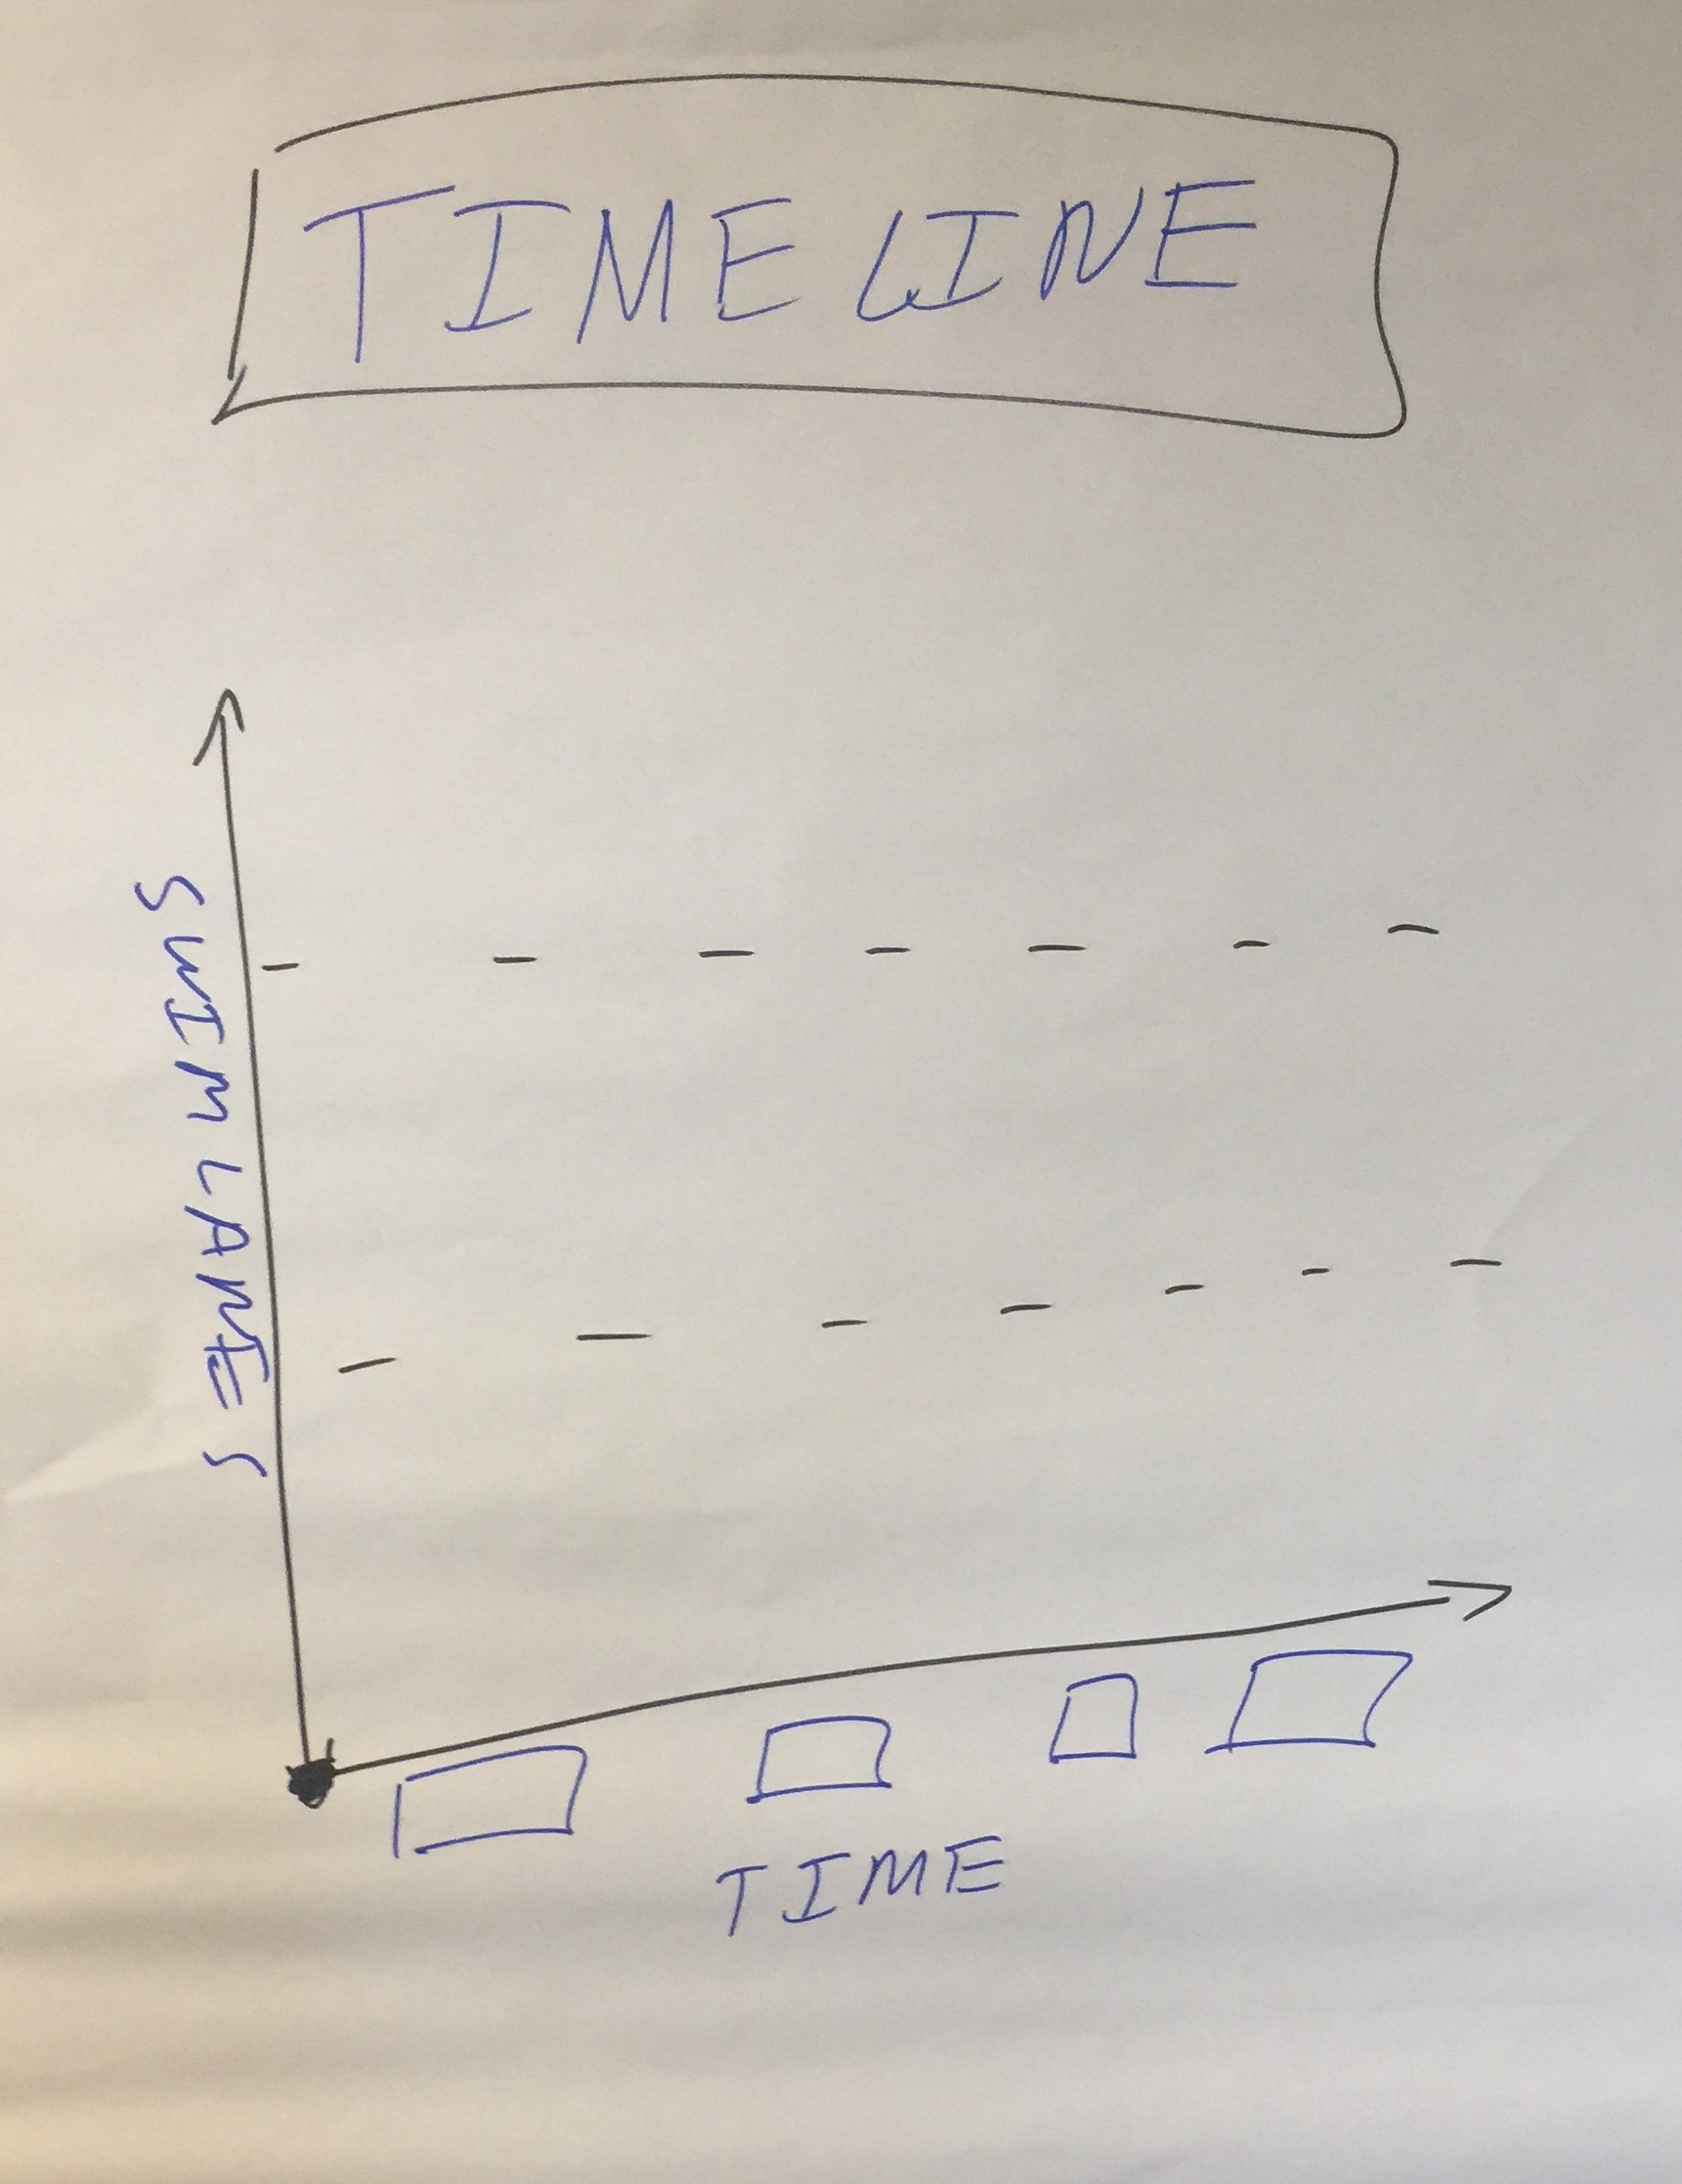 Timeline Retrospective - Timeline example